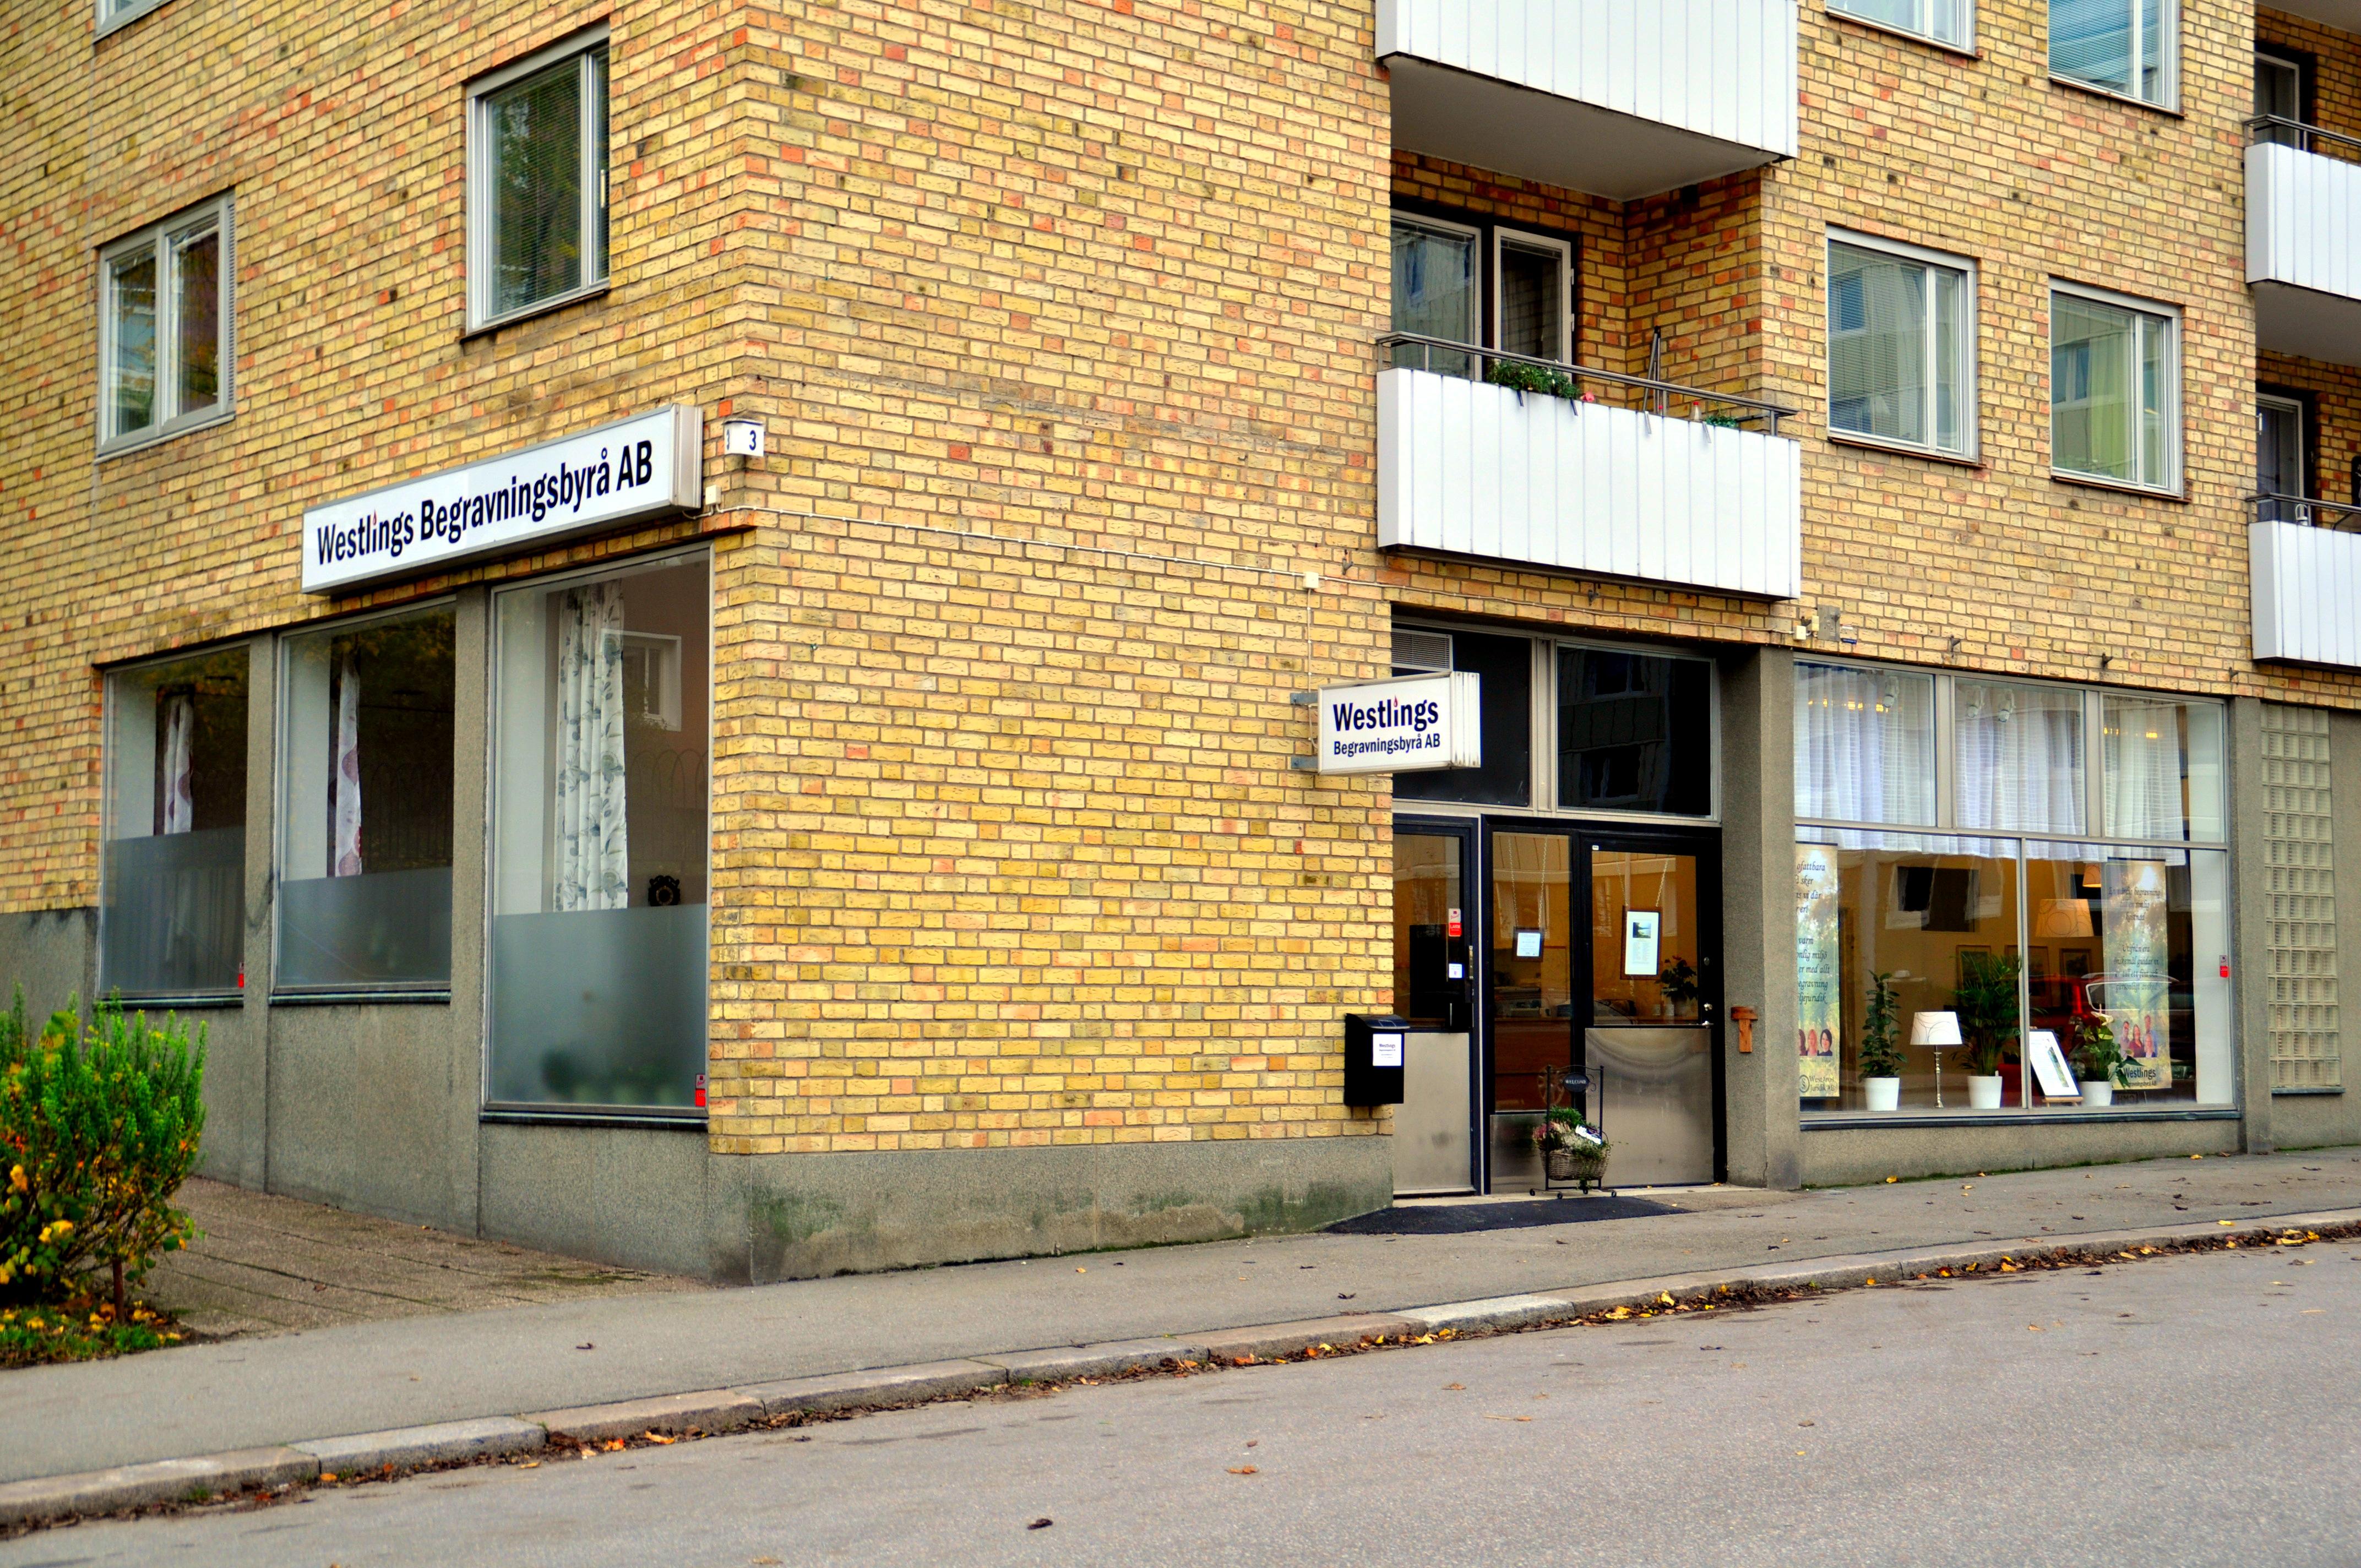 Westlings Begravningsbyrå, Rosenhällsgatan 3 Eskilstuna